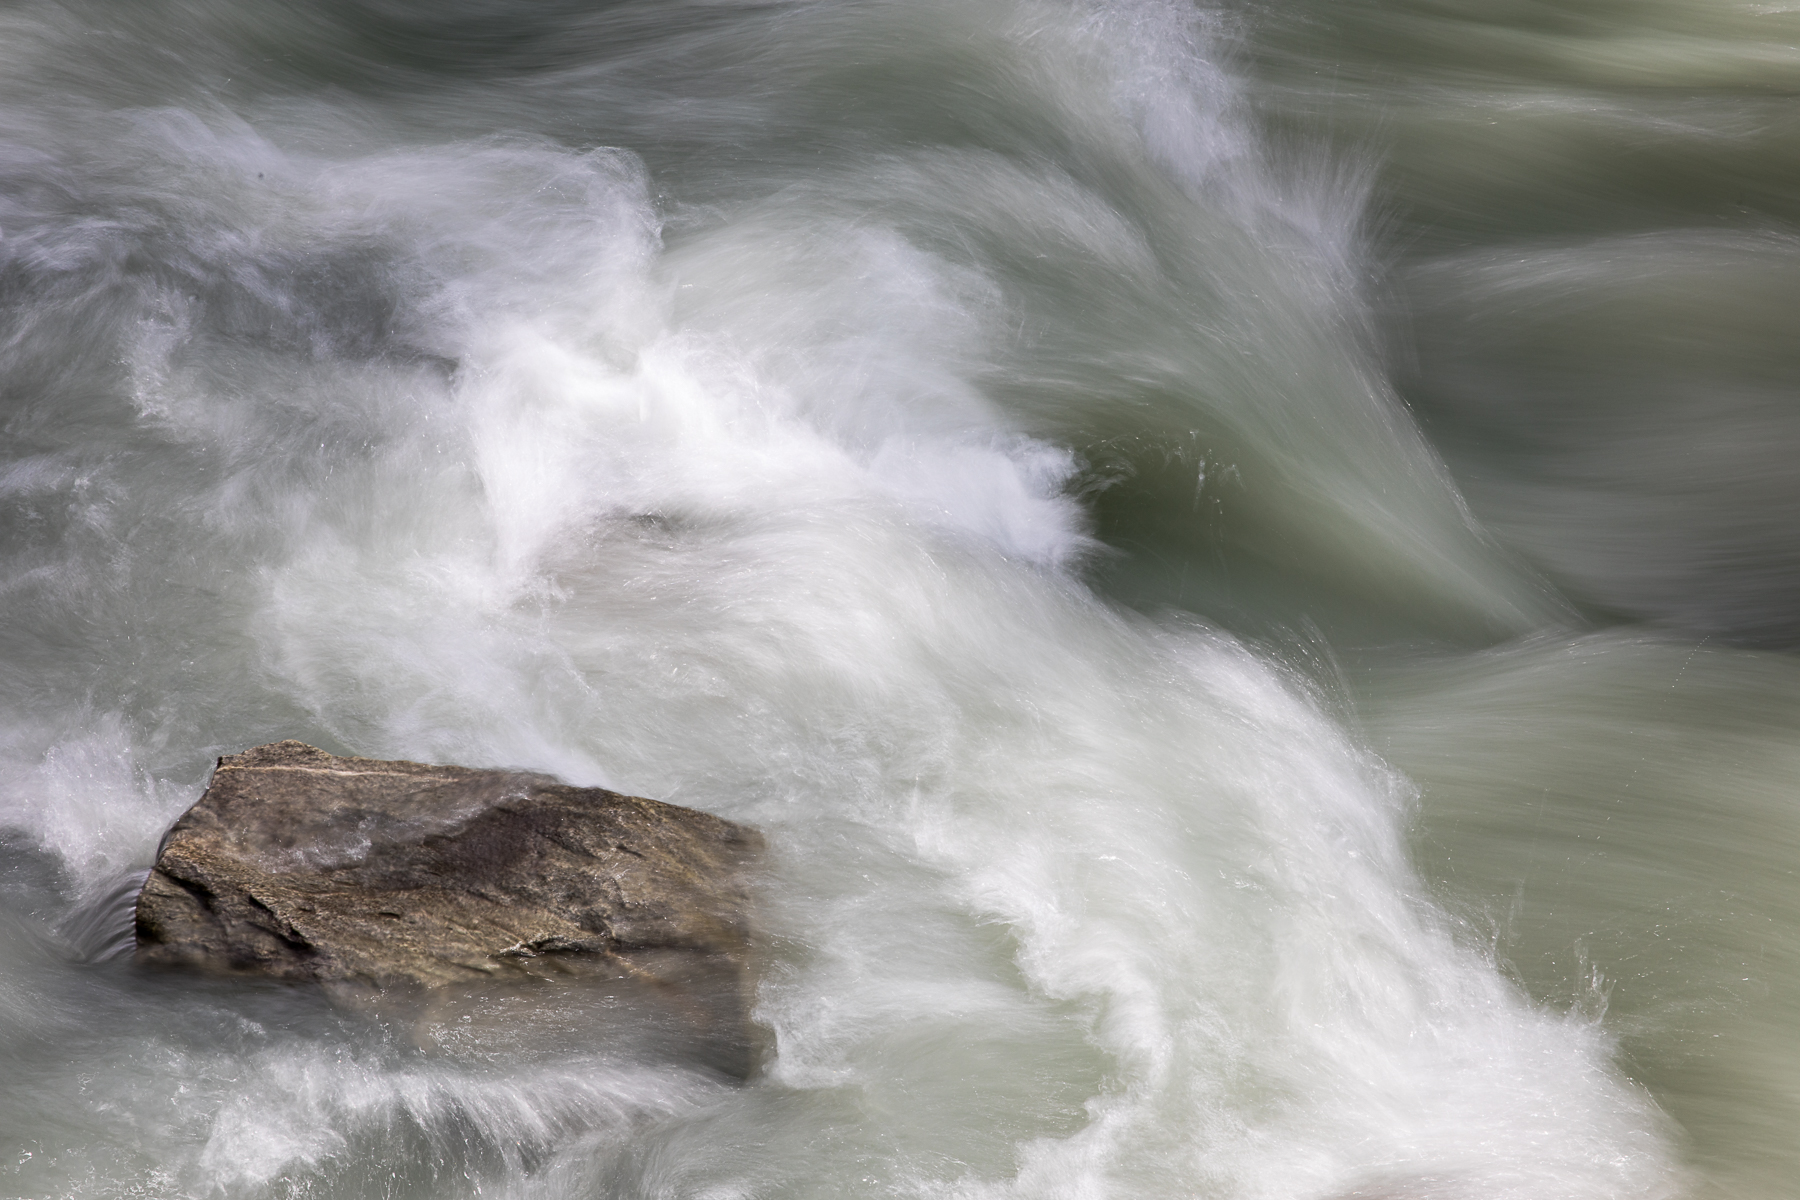 Steph Thompson, Mystic River, 2020